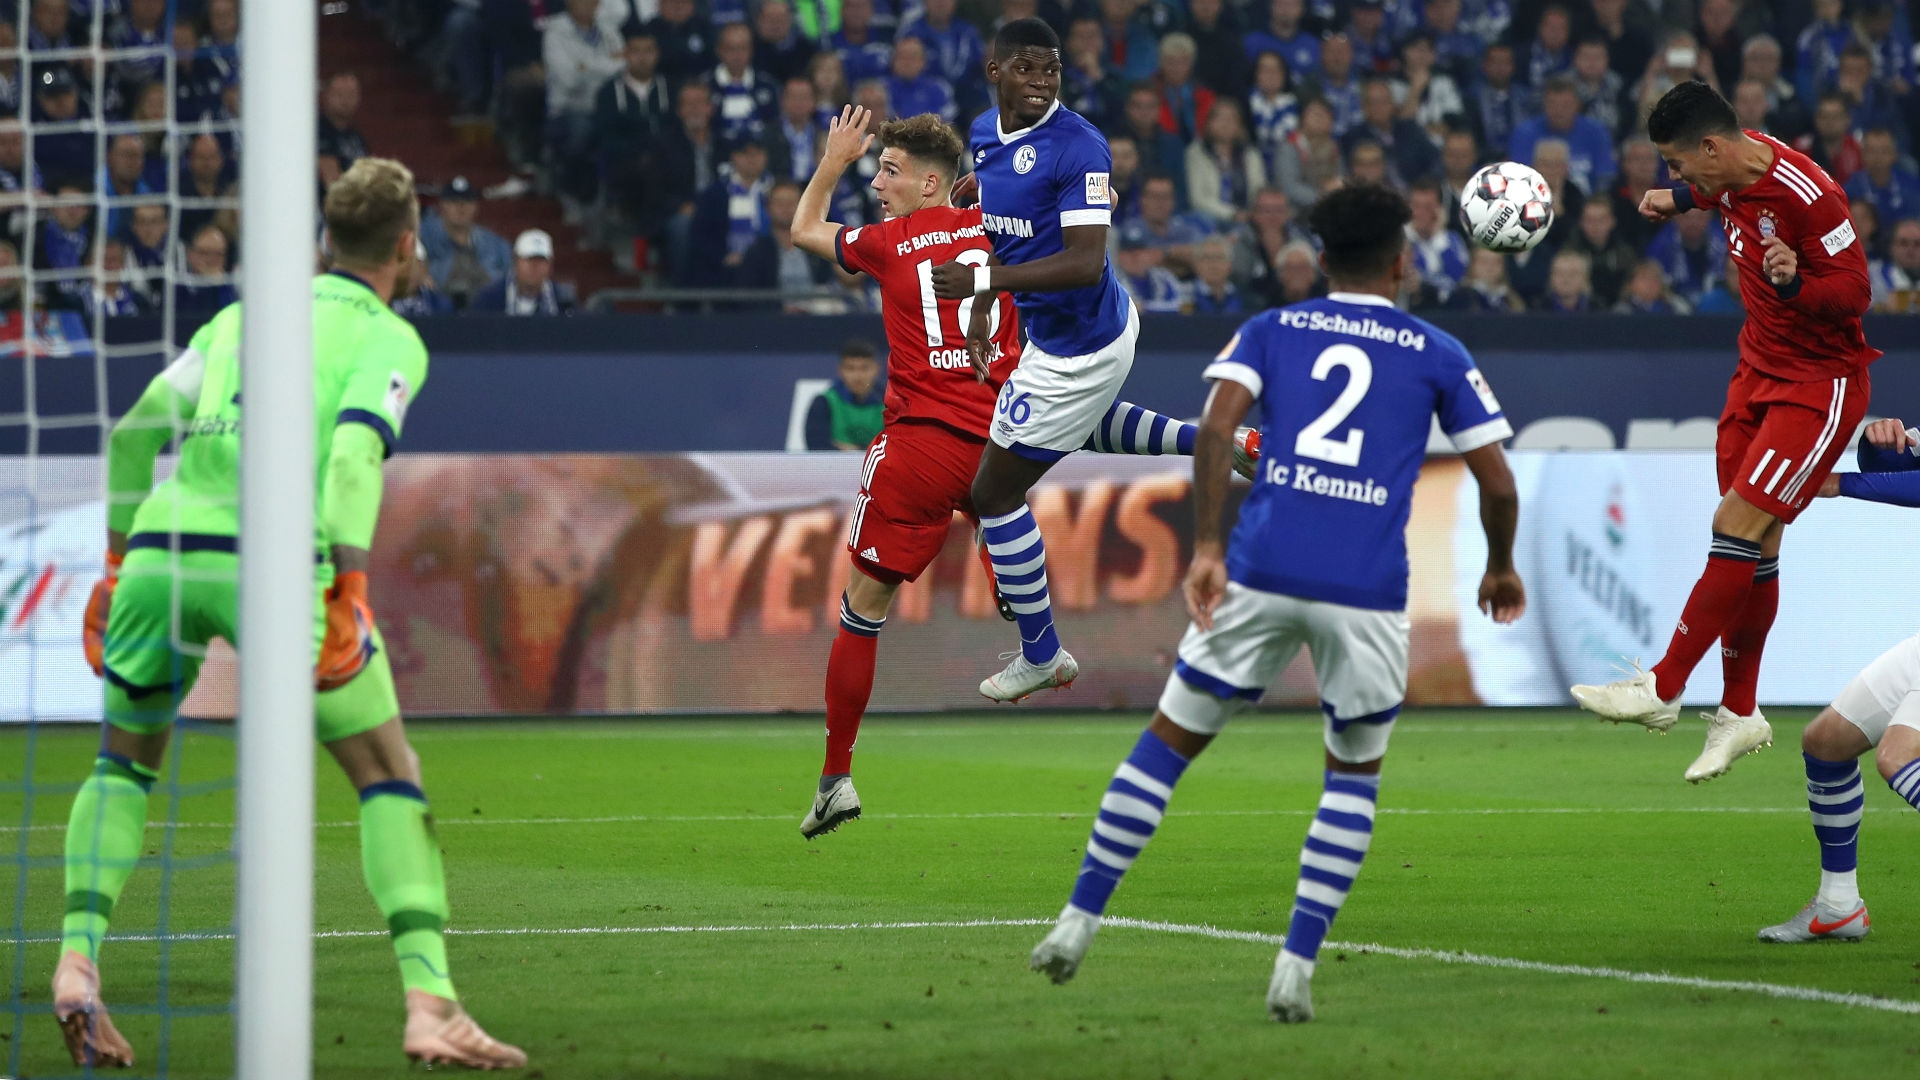 Schalke Bayern Live